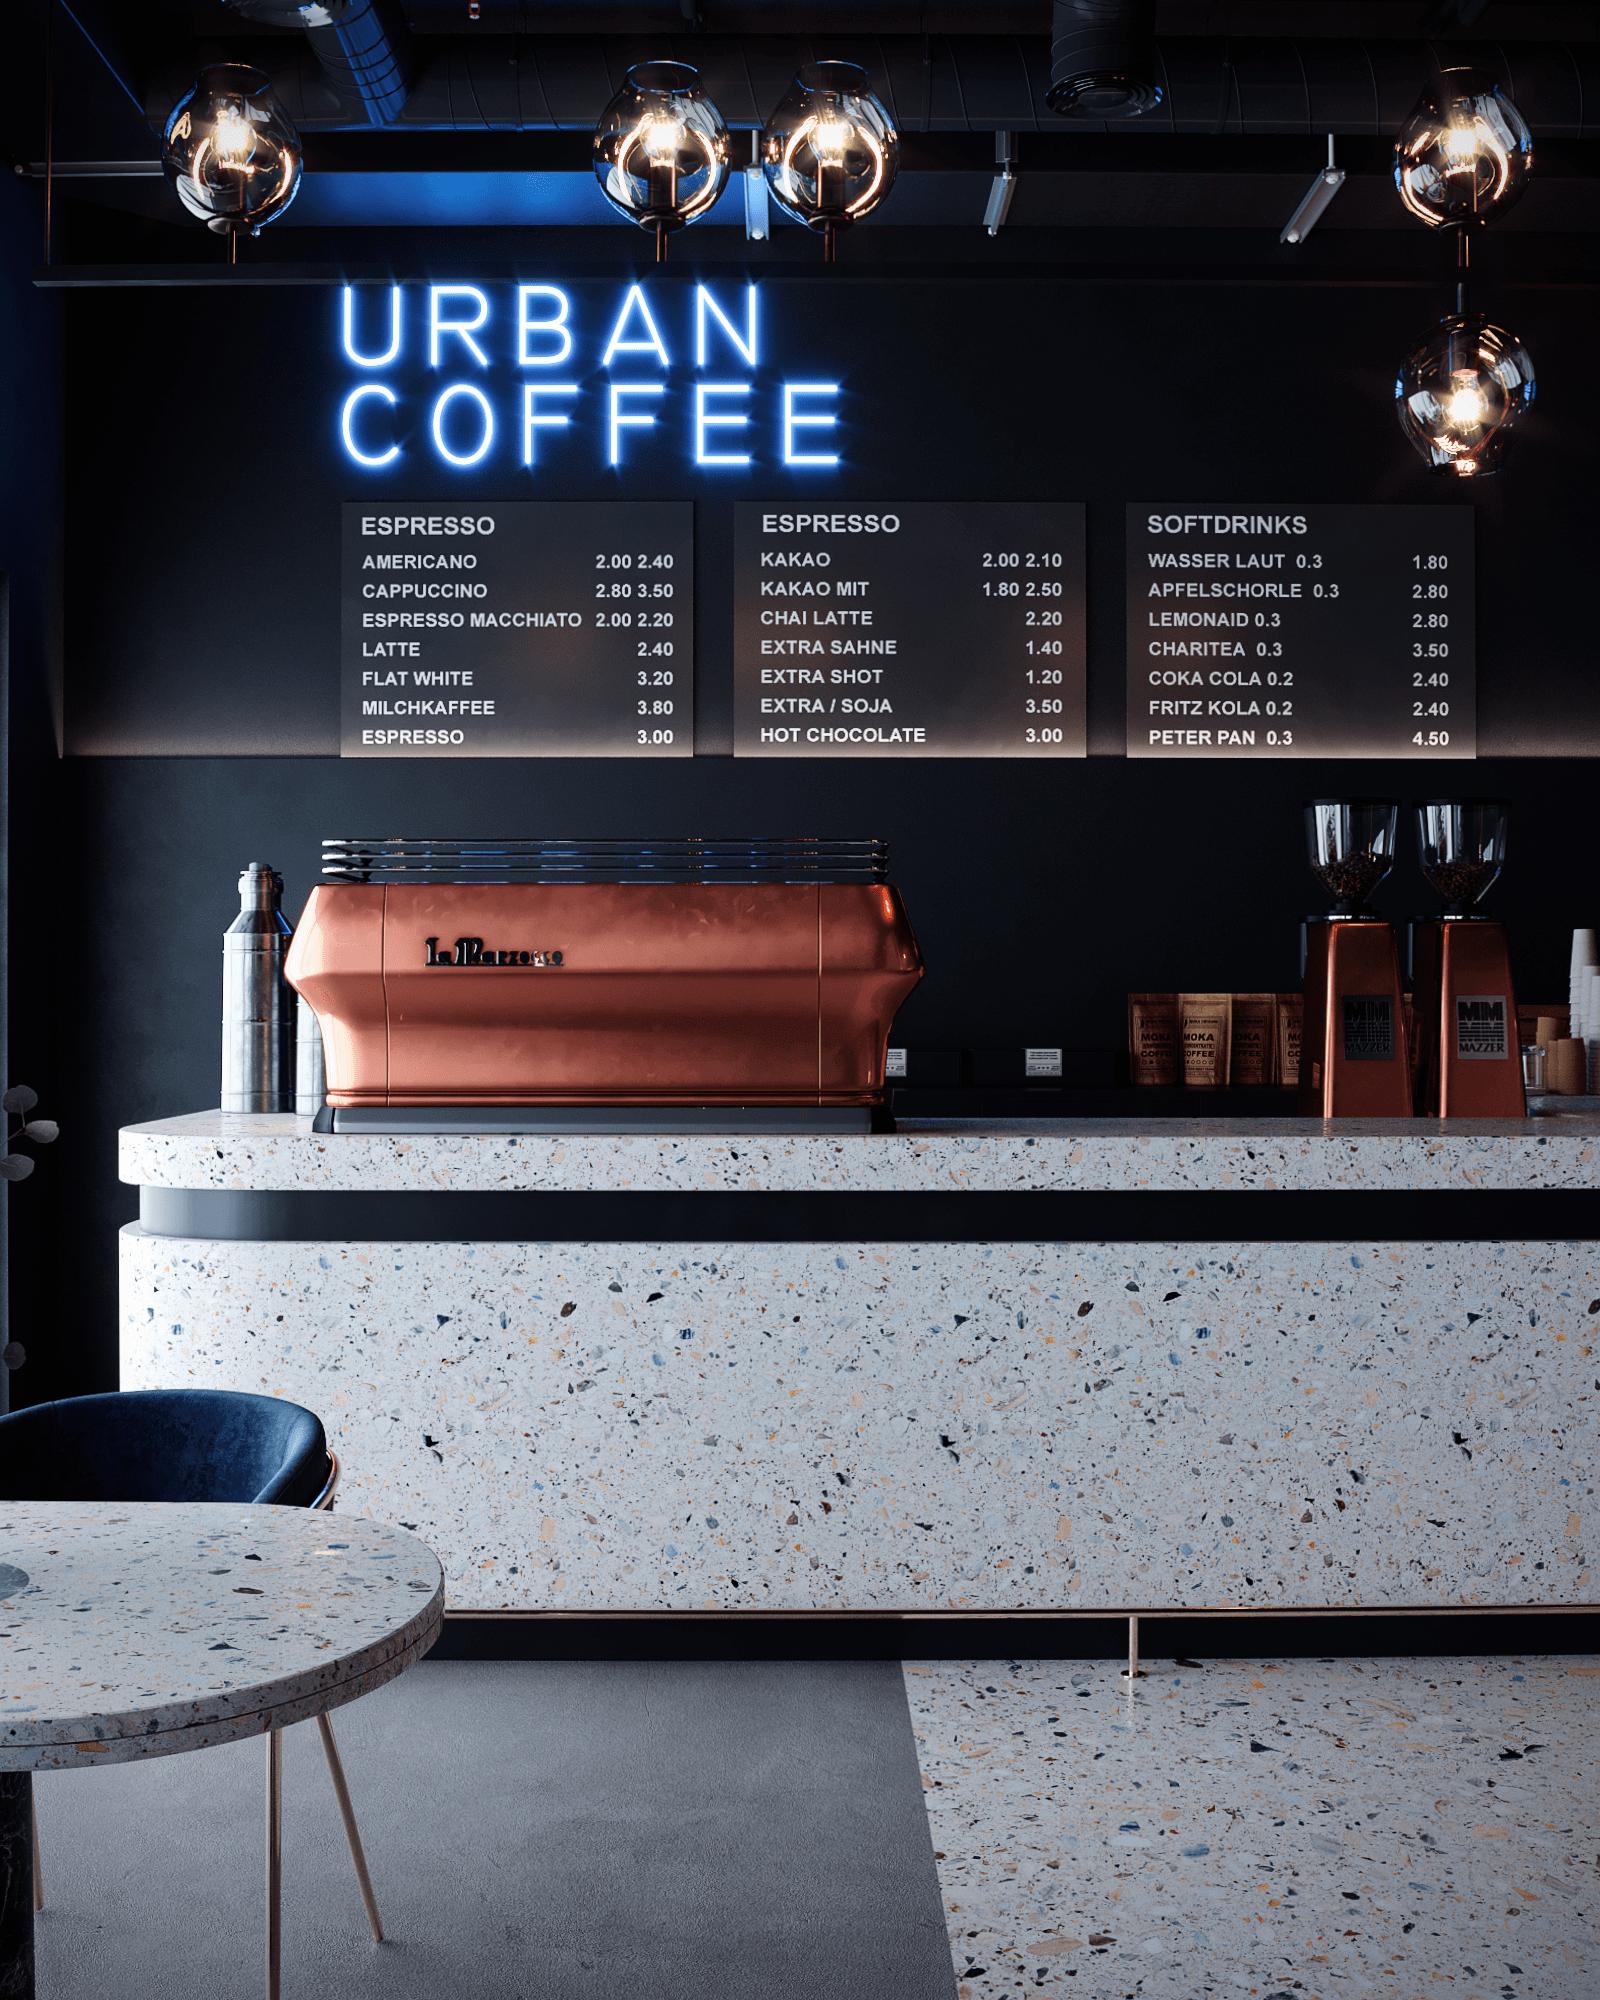 https://studioautograph.com/wp-content/uploads/2021/02/studio-autograph-ltd-berlin-design-cafe2-min.png